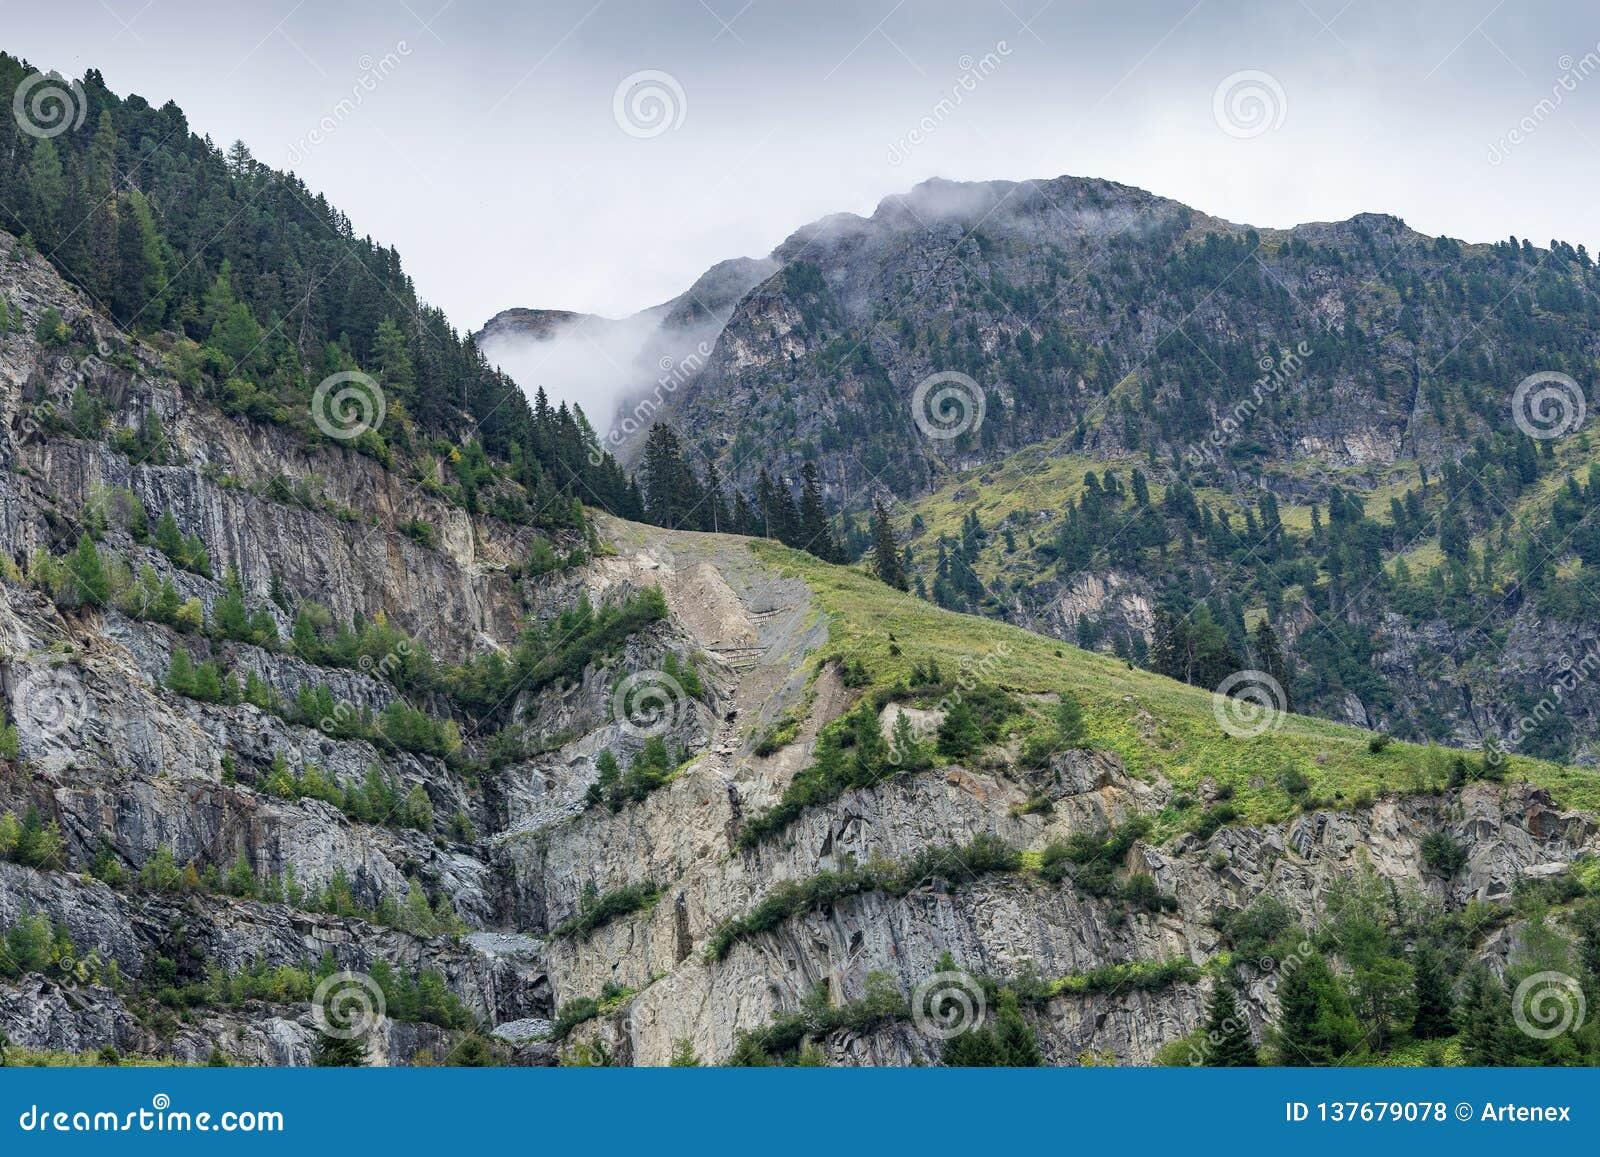 Mountains, peaks, lake, everlasting ice and trees landscape.